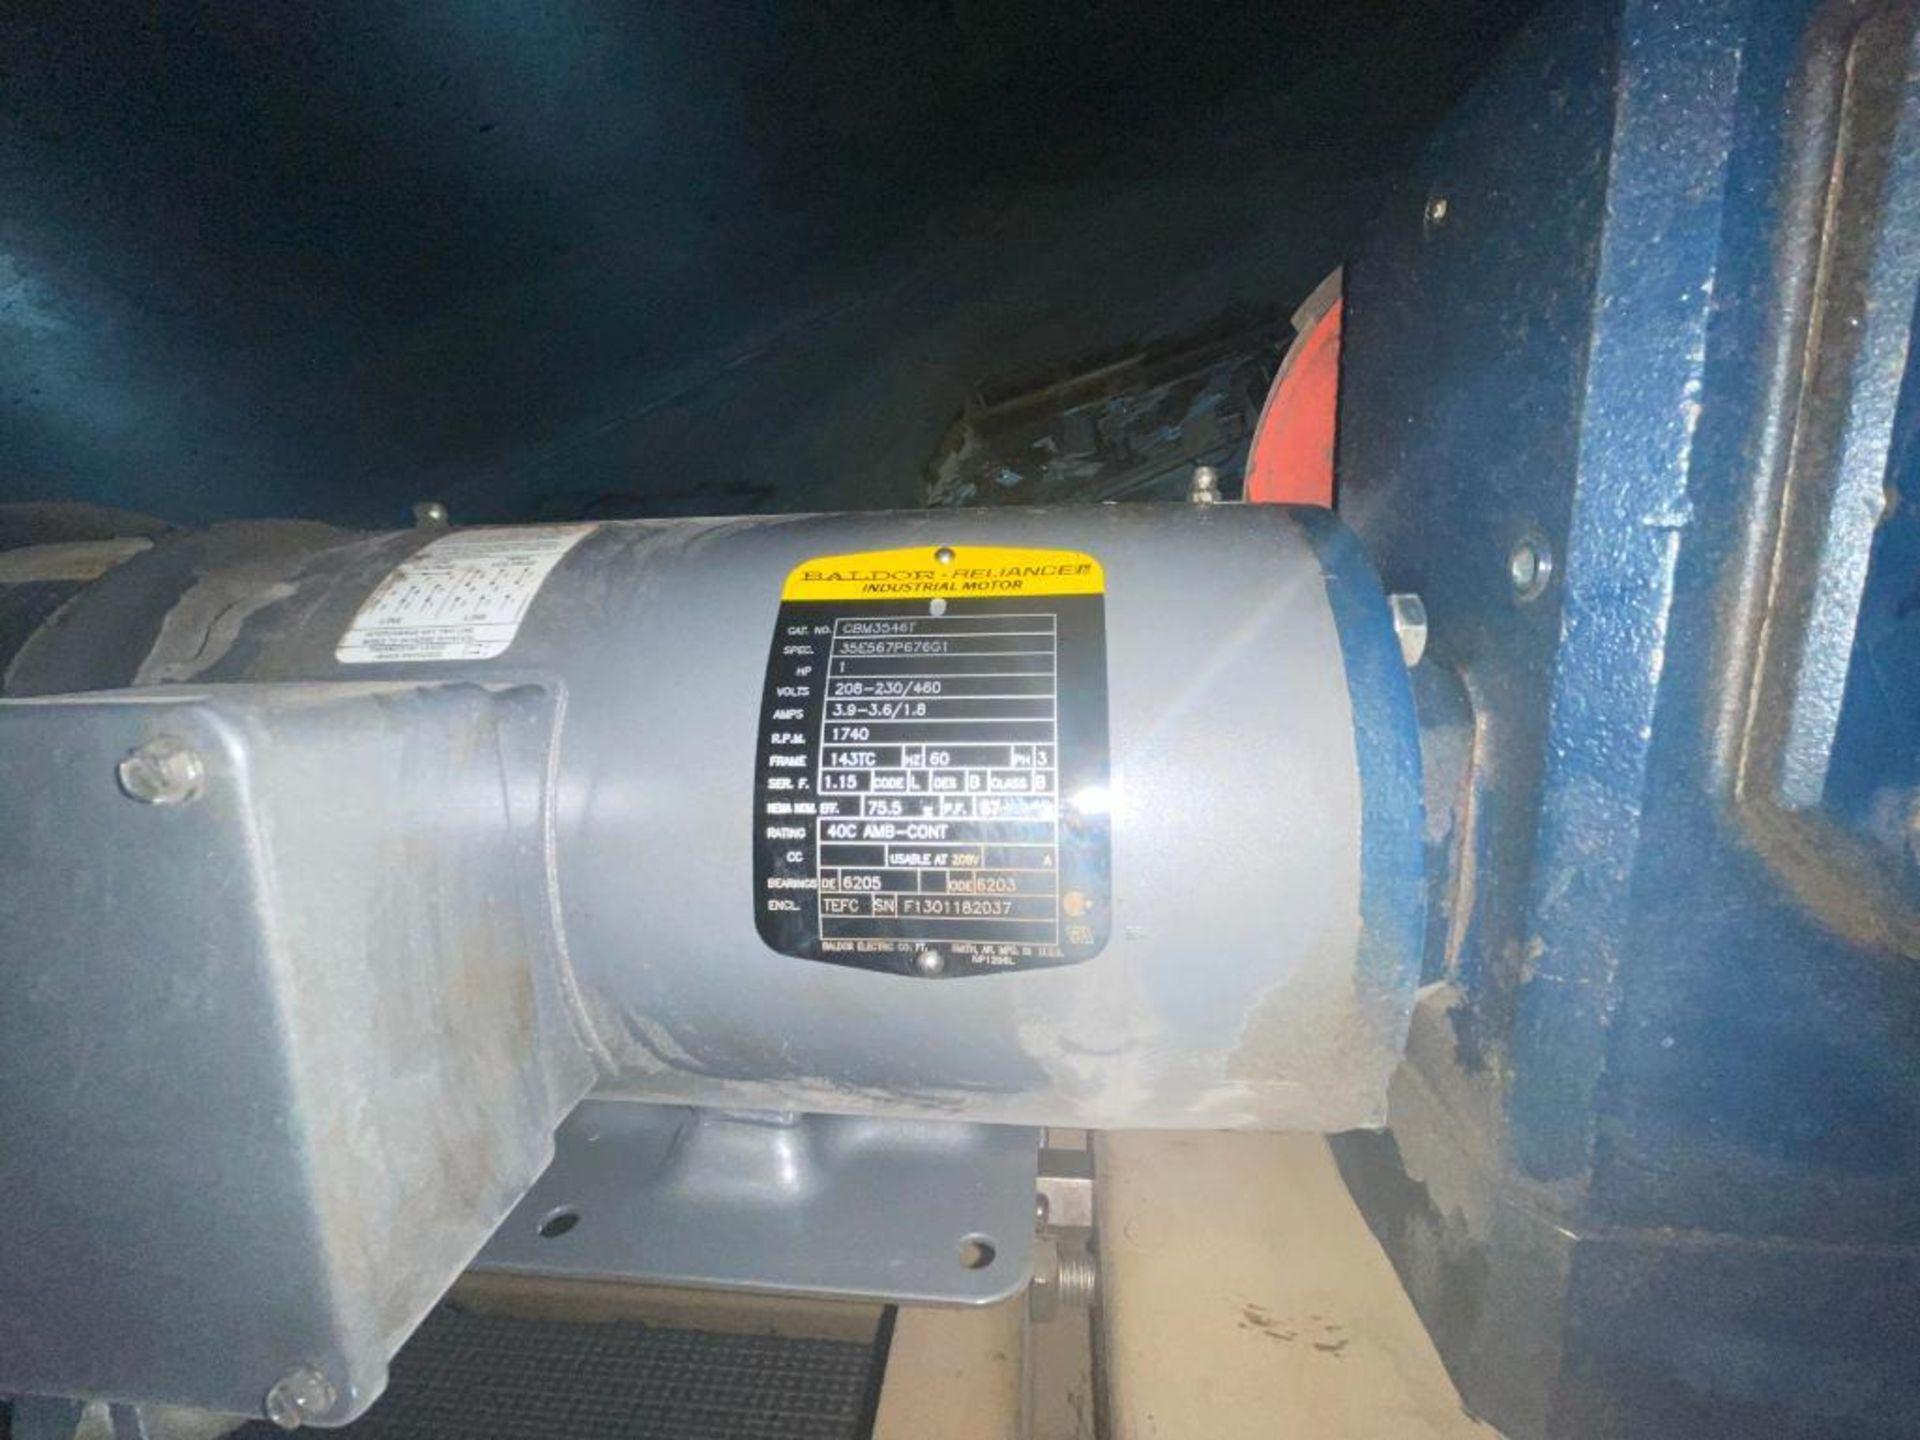 Mathews mild steel incline conveyor - Image 10 of 10